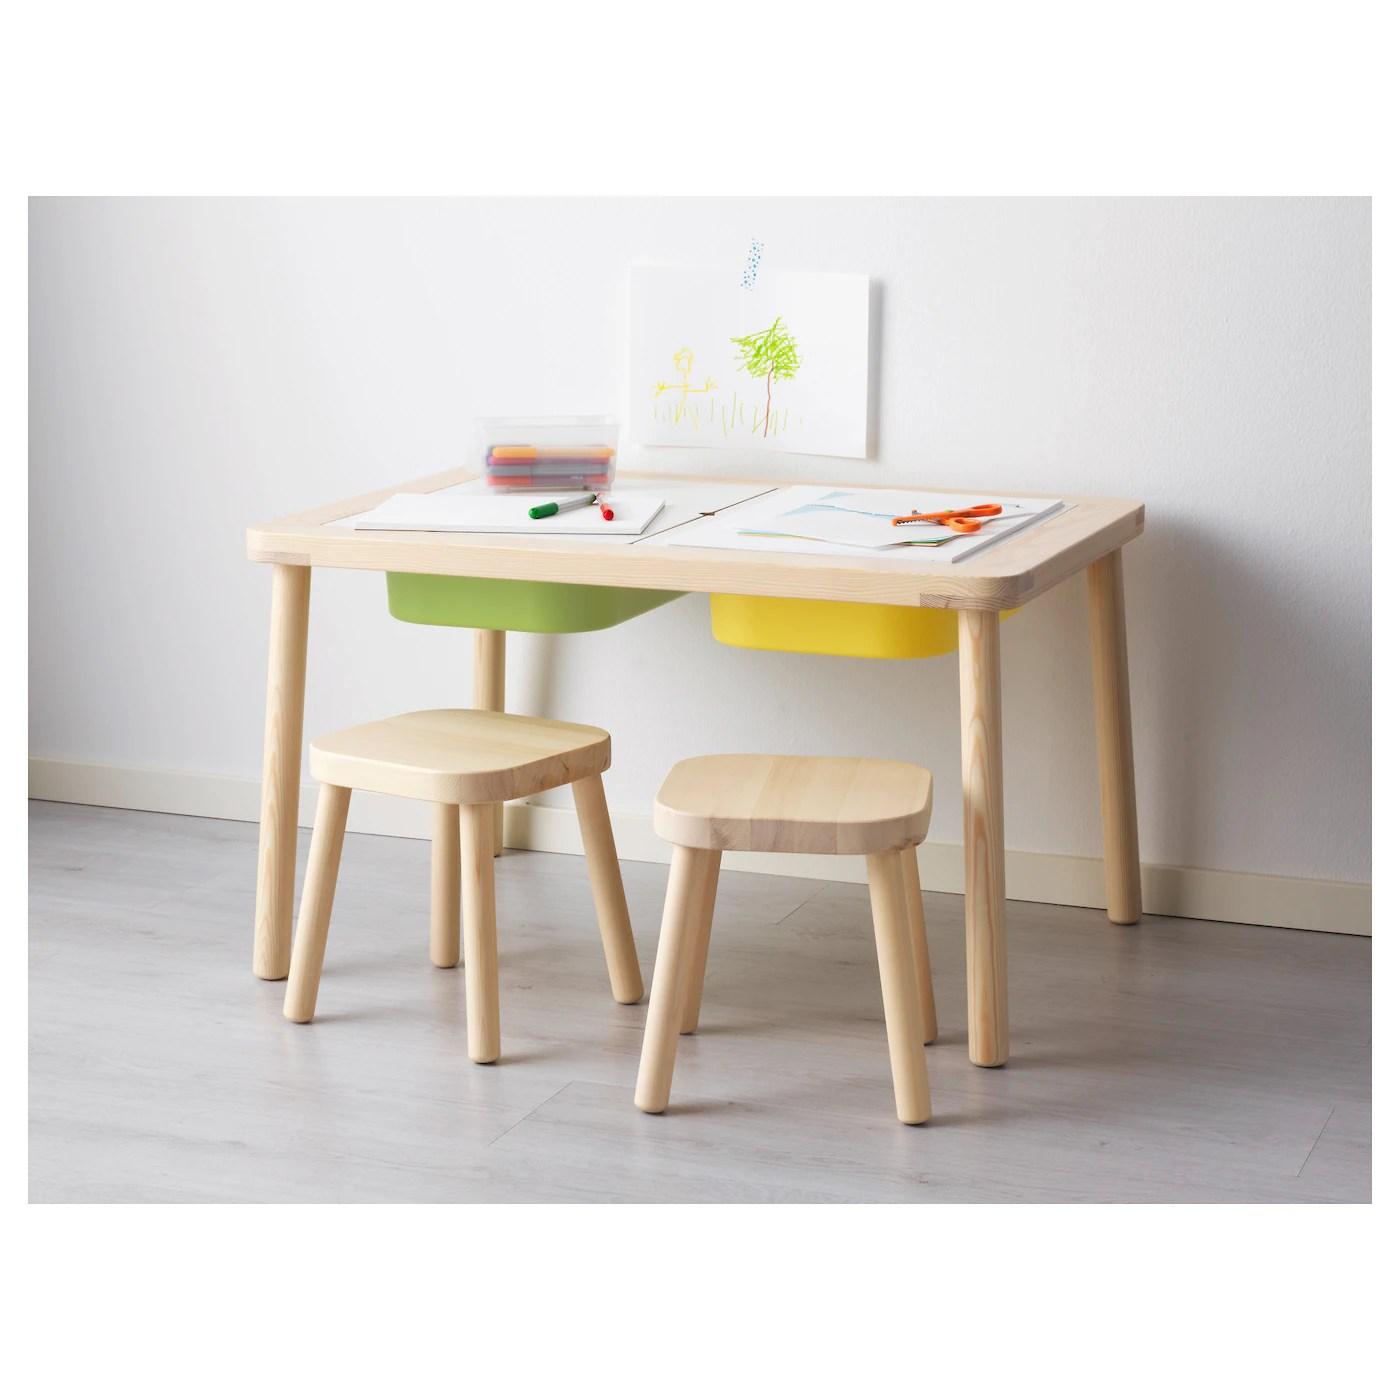 Flisat Children S Table 32 5 8x22 7 8 Ikea